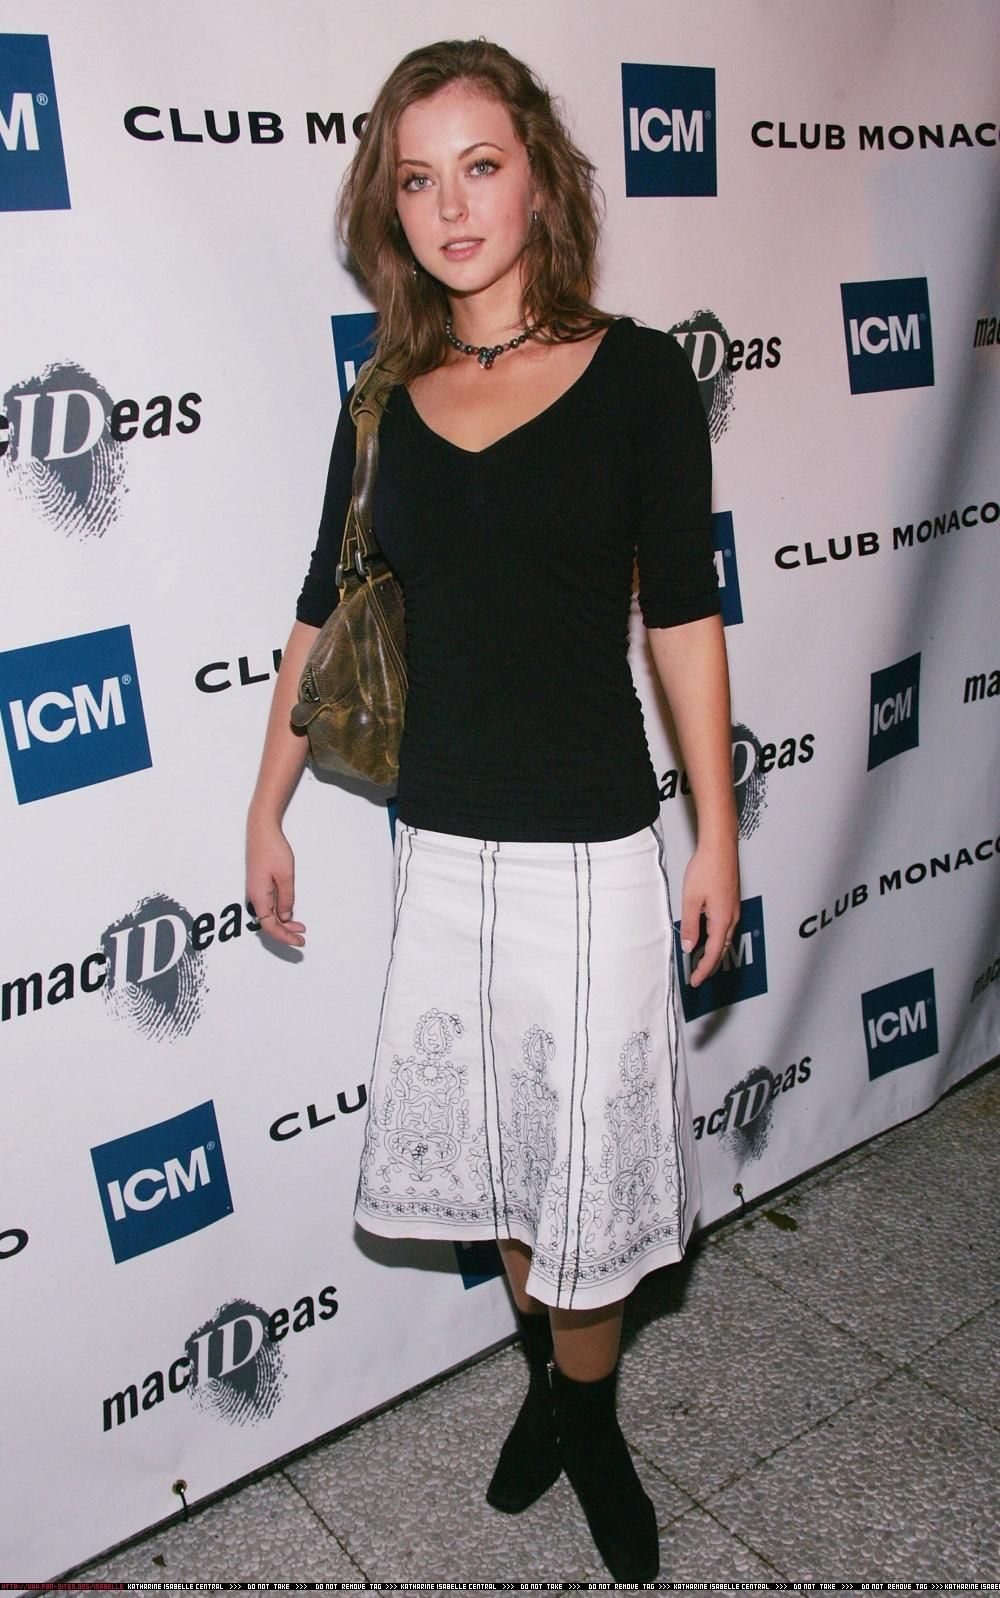 images Joanna Lumley (born 1946 (born in Srinagar, India)